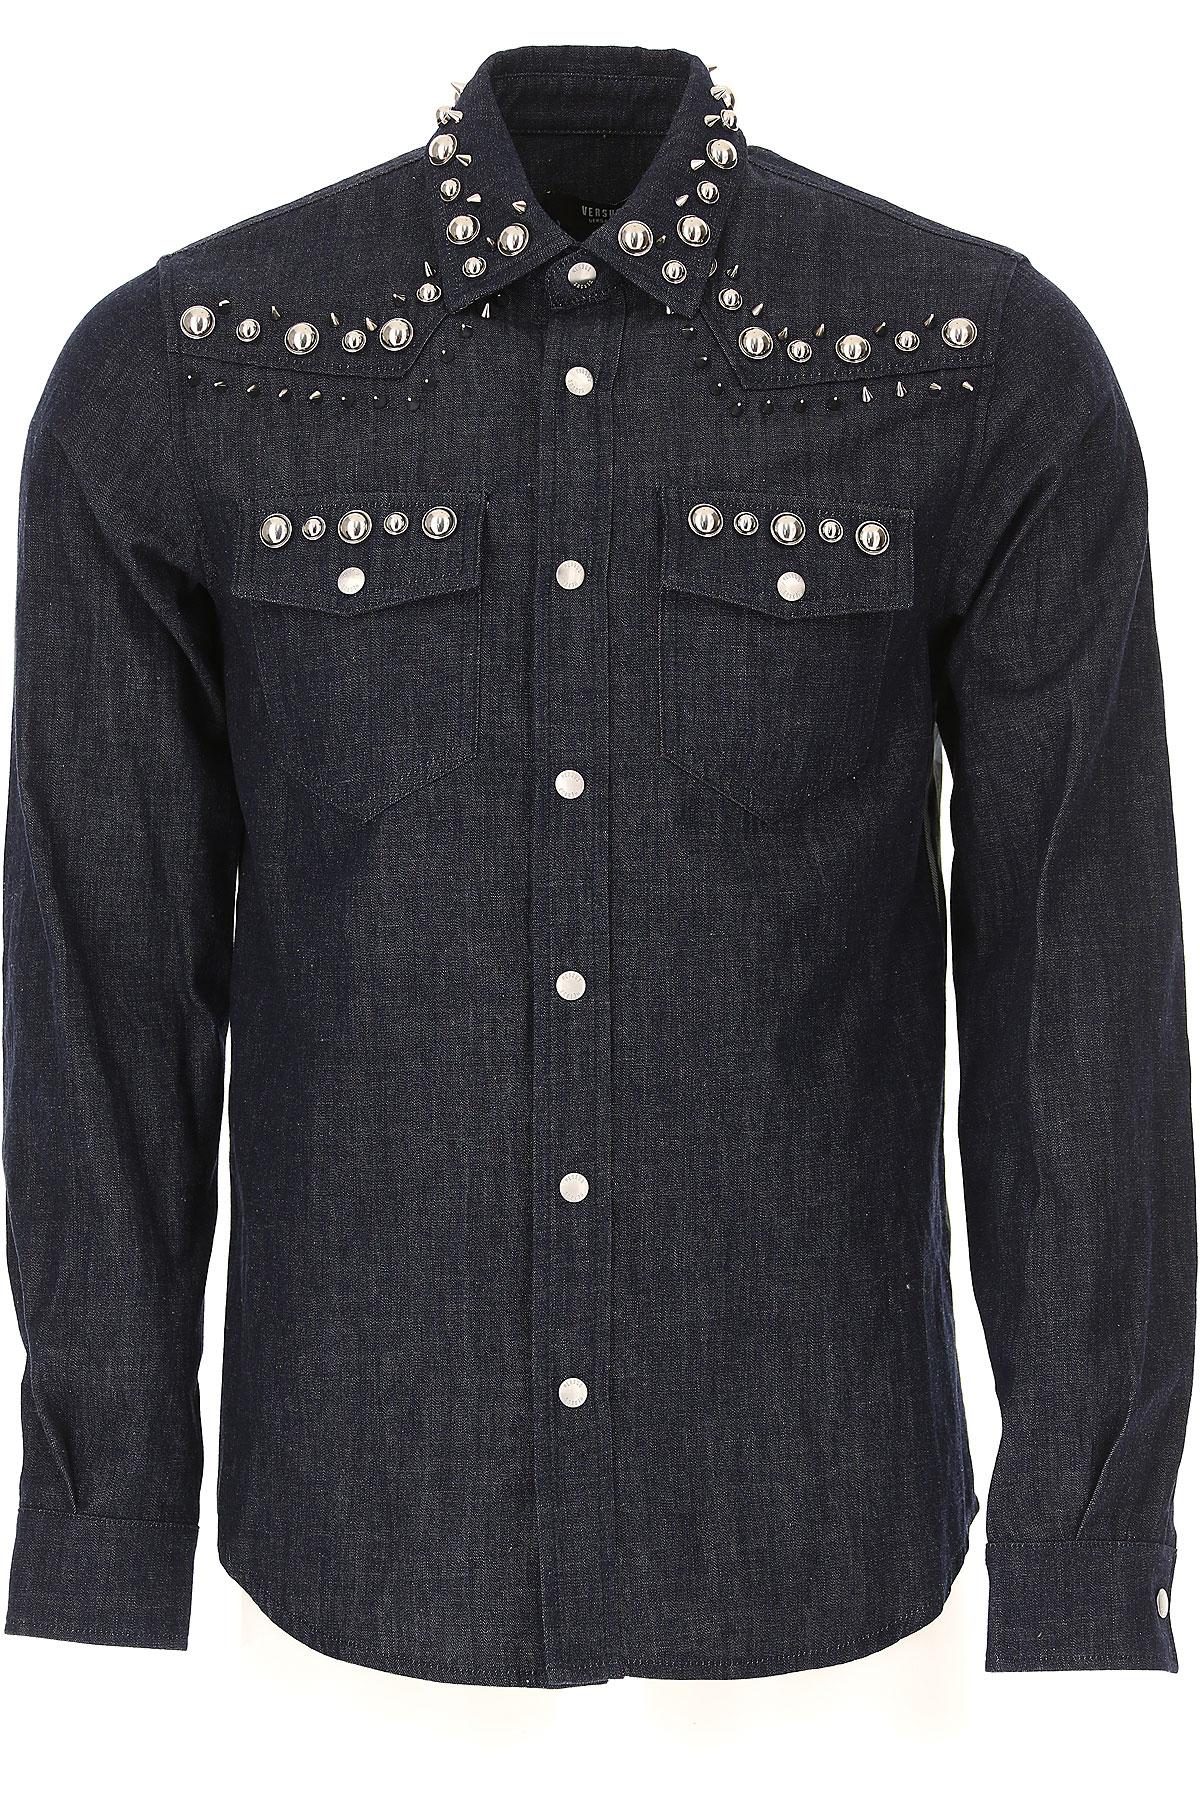 e1ed40483d50 Versace Πουκάμισο για Άνδρες Σε Έκπτωση Στο Outlet